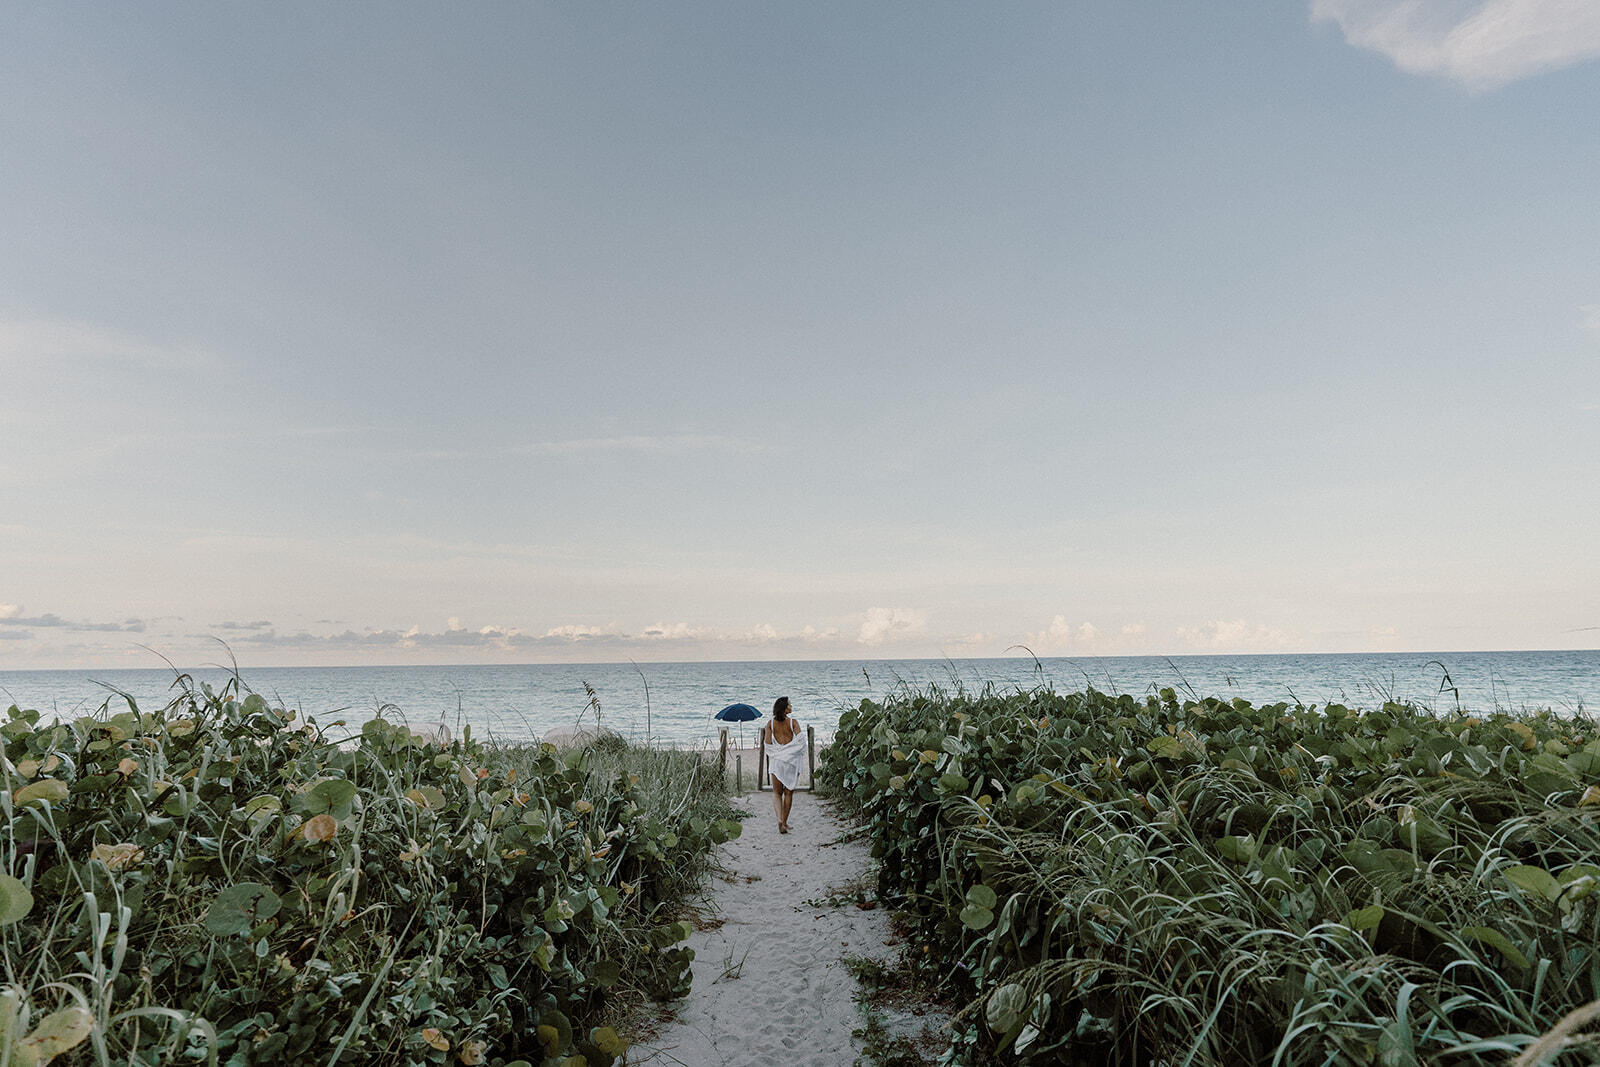 AMBASSADOR BEACH ENTRANCE